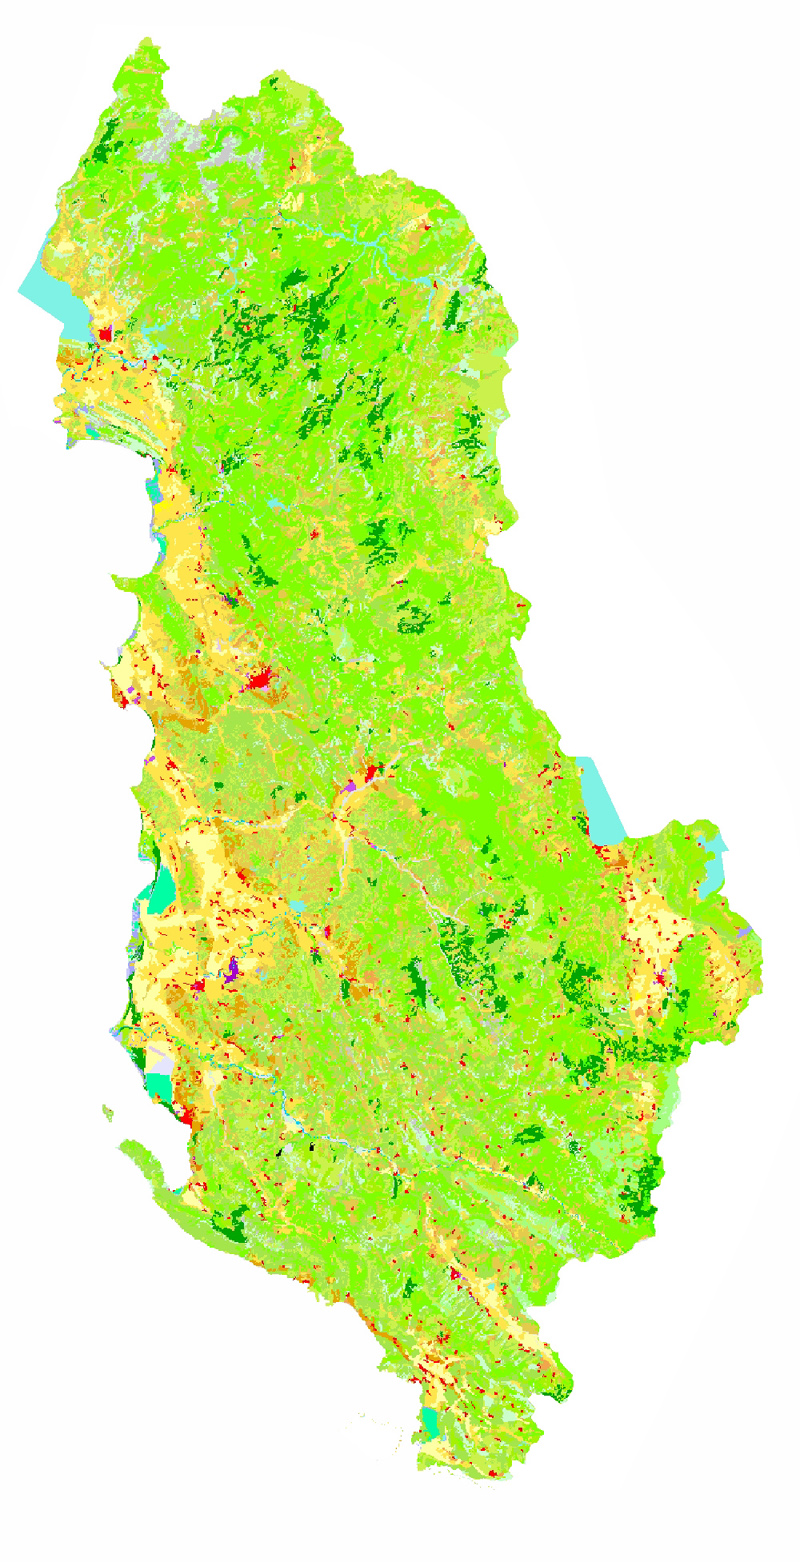 Corine Land Cover 2000 of Albania